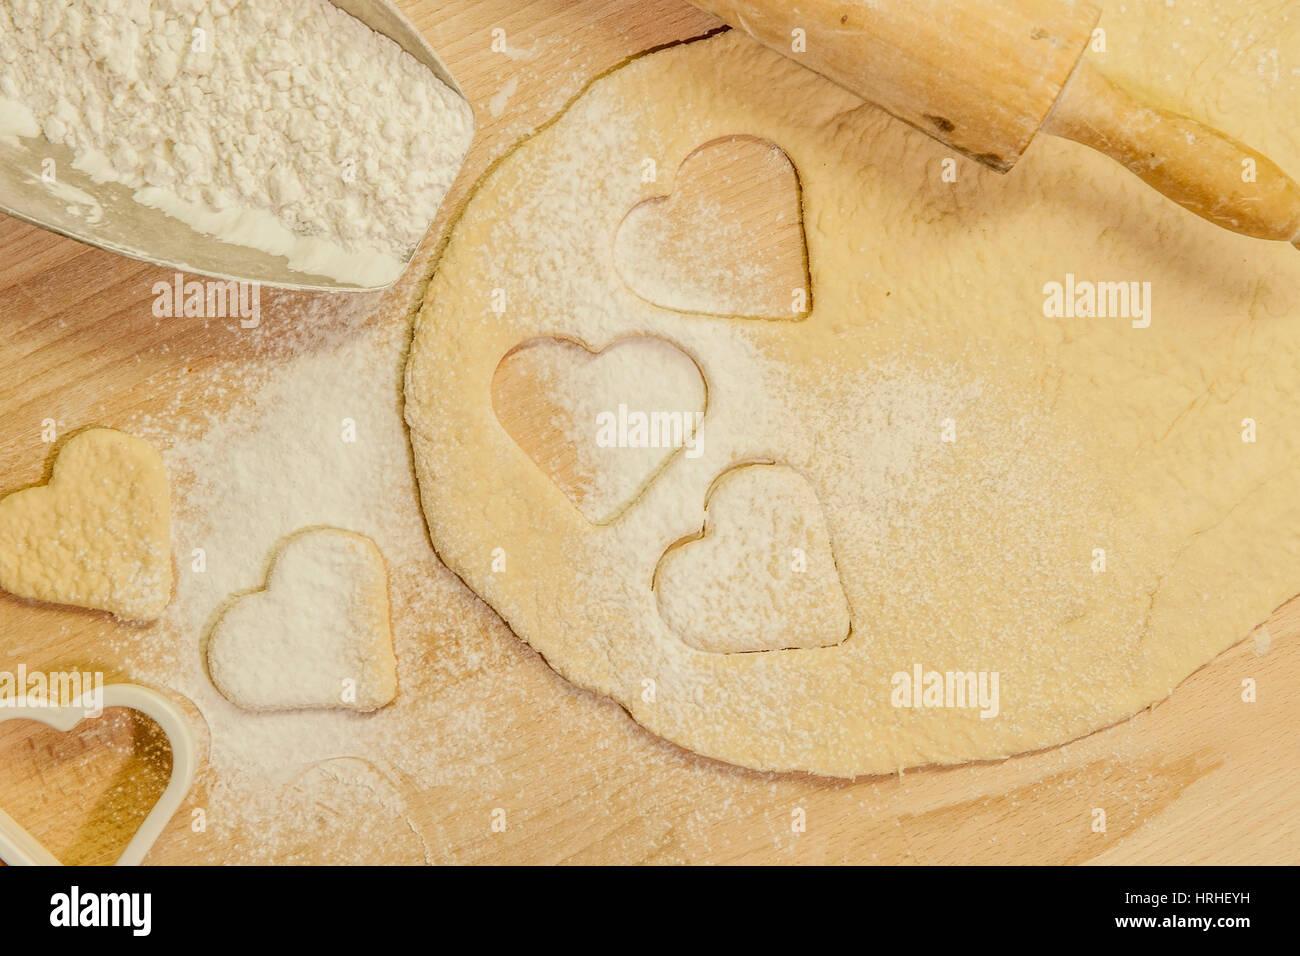 Kekse backen - baking cookies Stock Photo